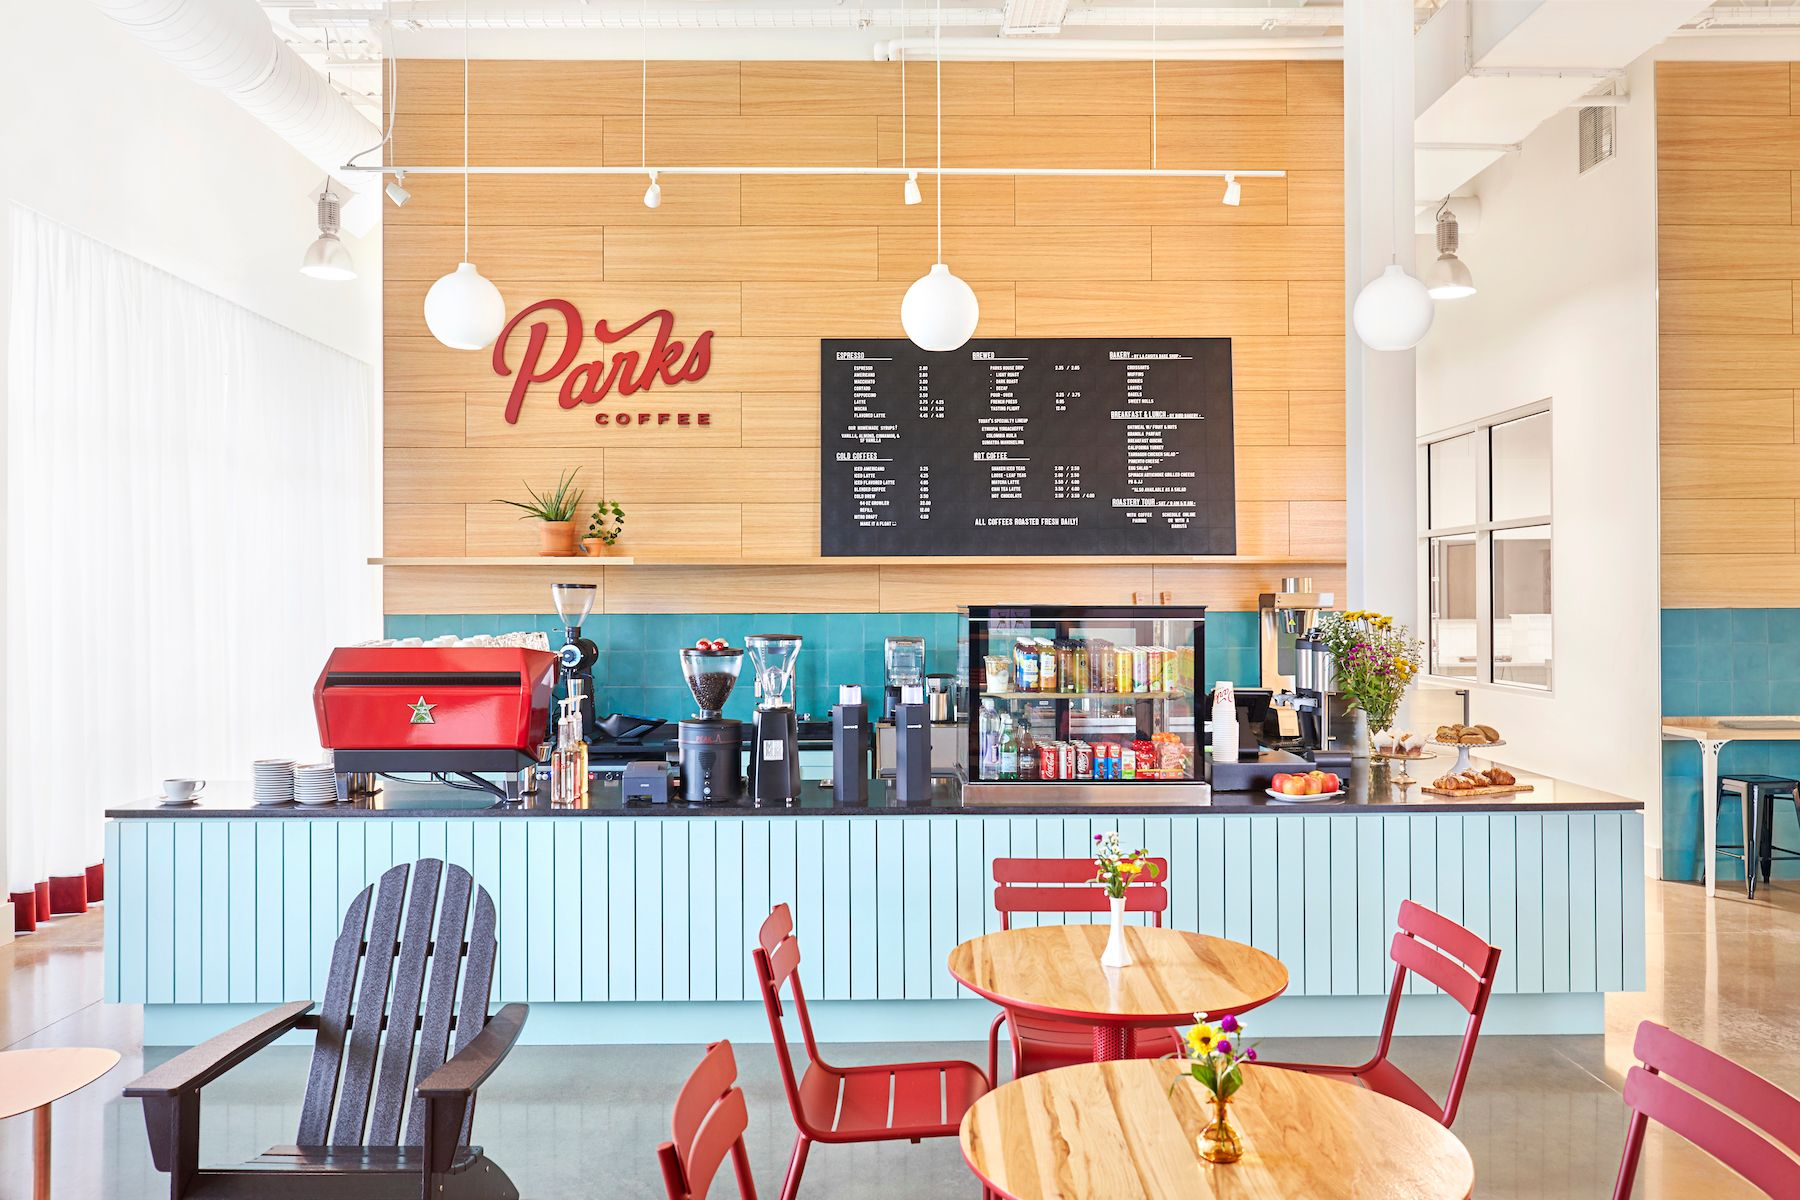 Parks Coffee Roastery & Cafe